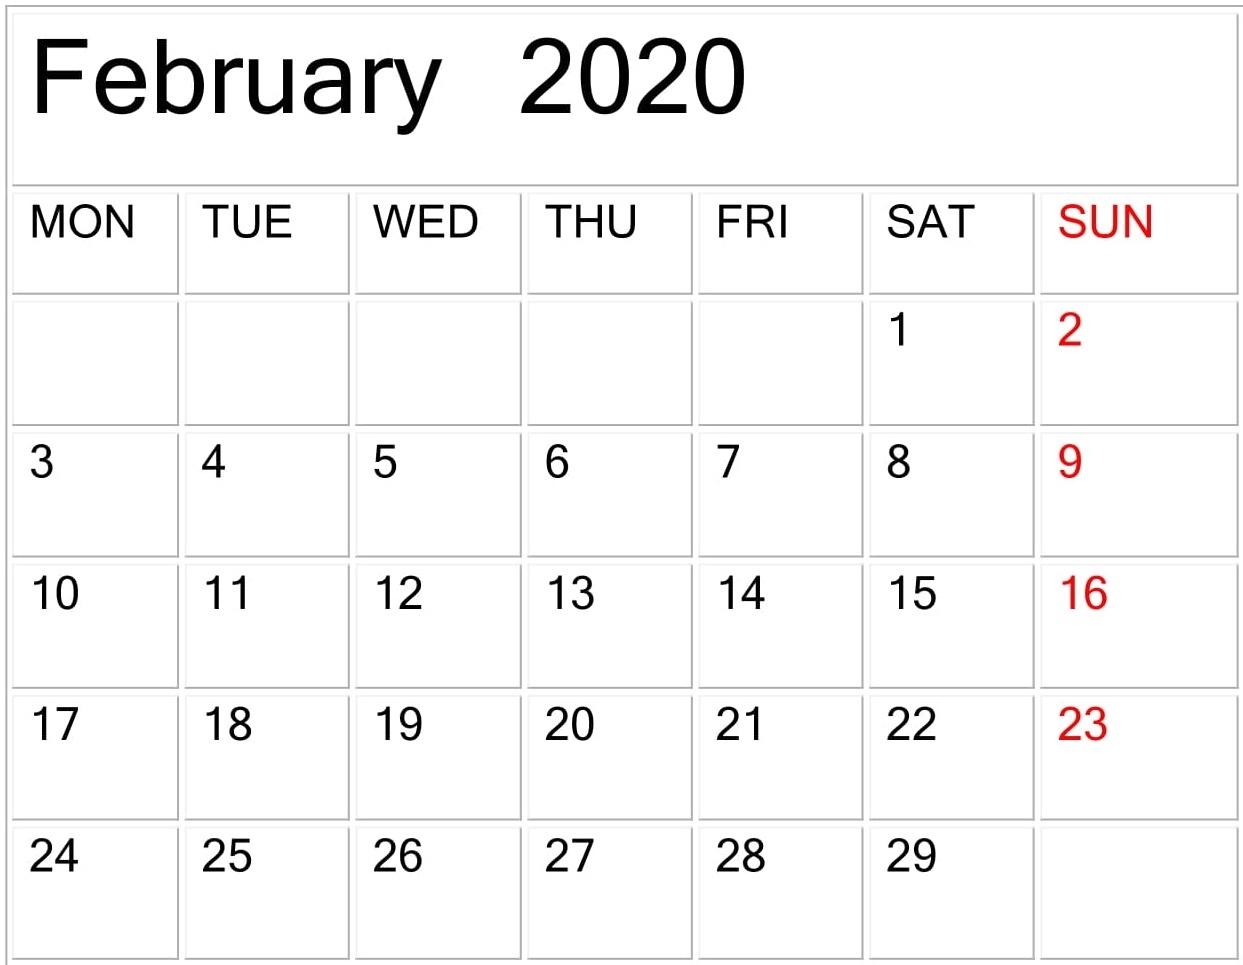 February 2020 Calendar Template Large Print - Latest